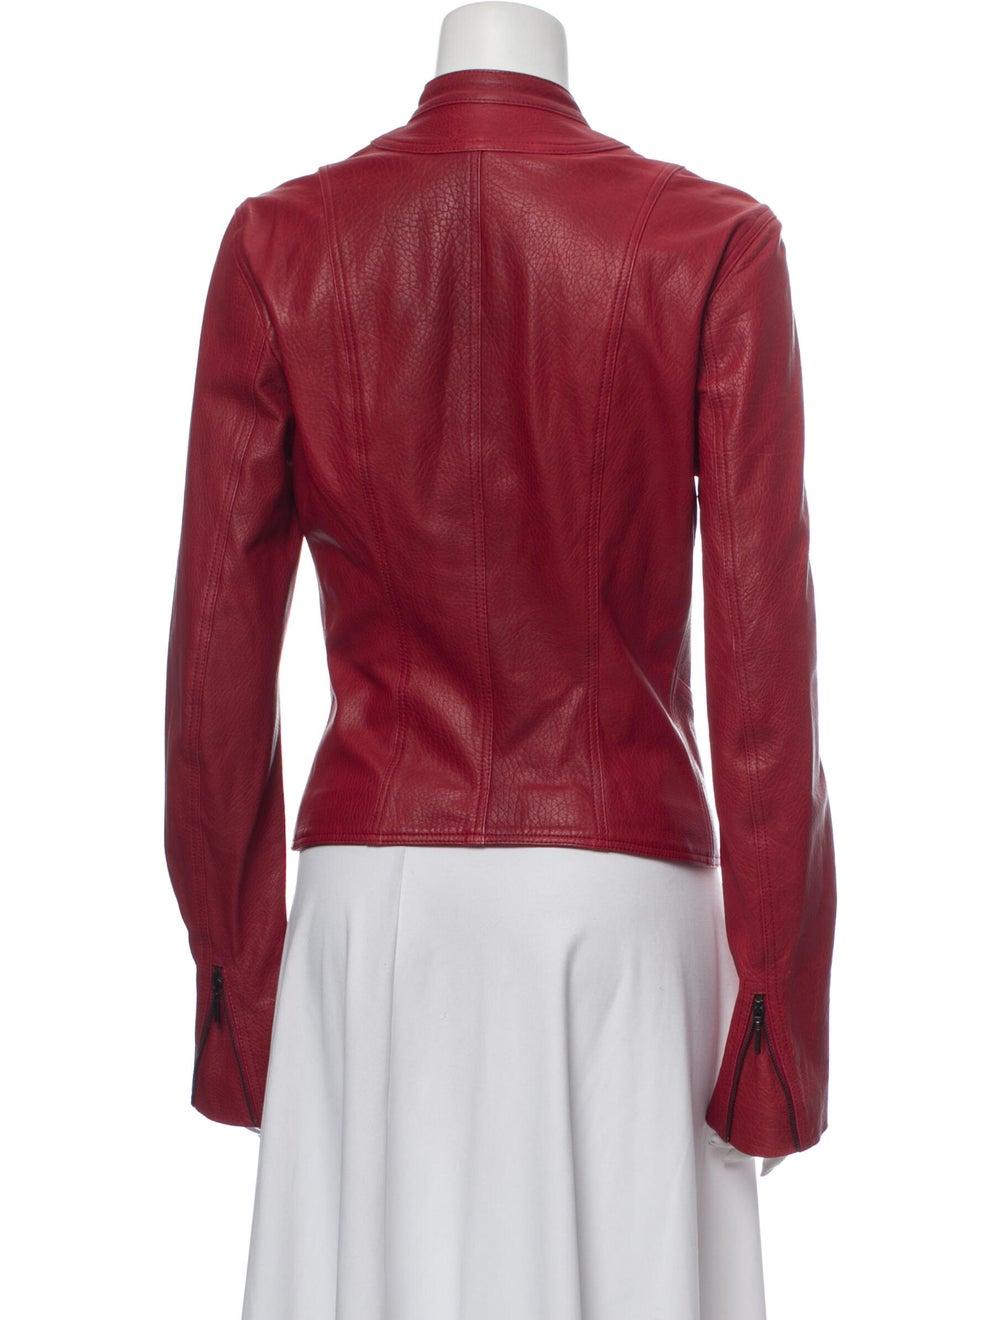 Plein Sud Lamb Leather Biker Jacket Red - image 3